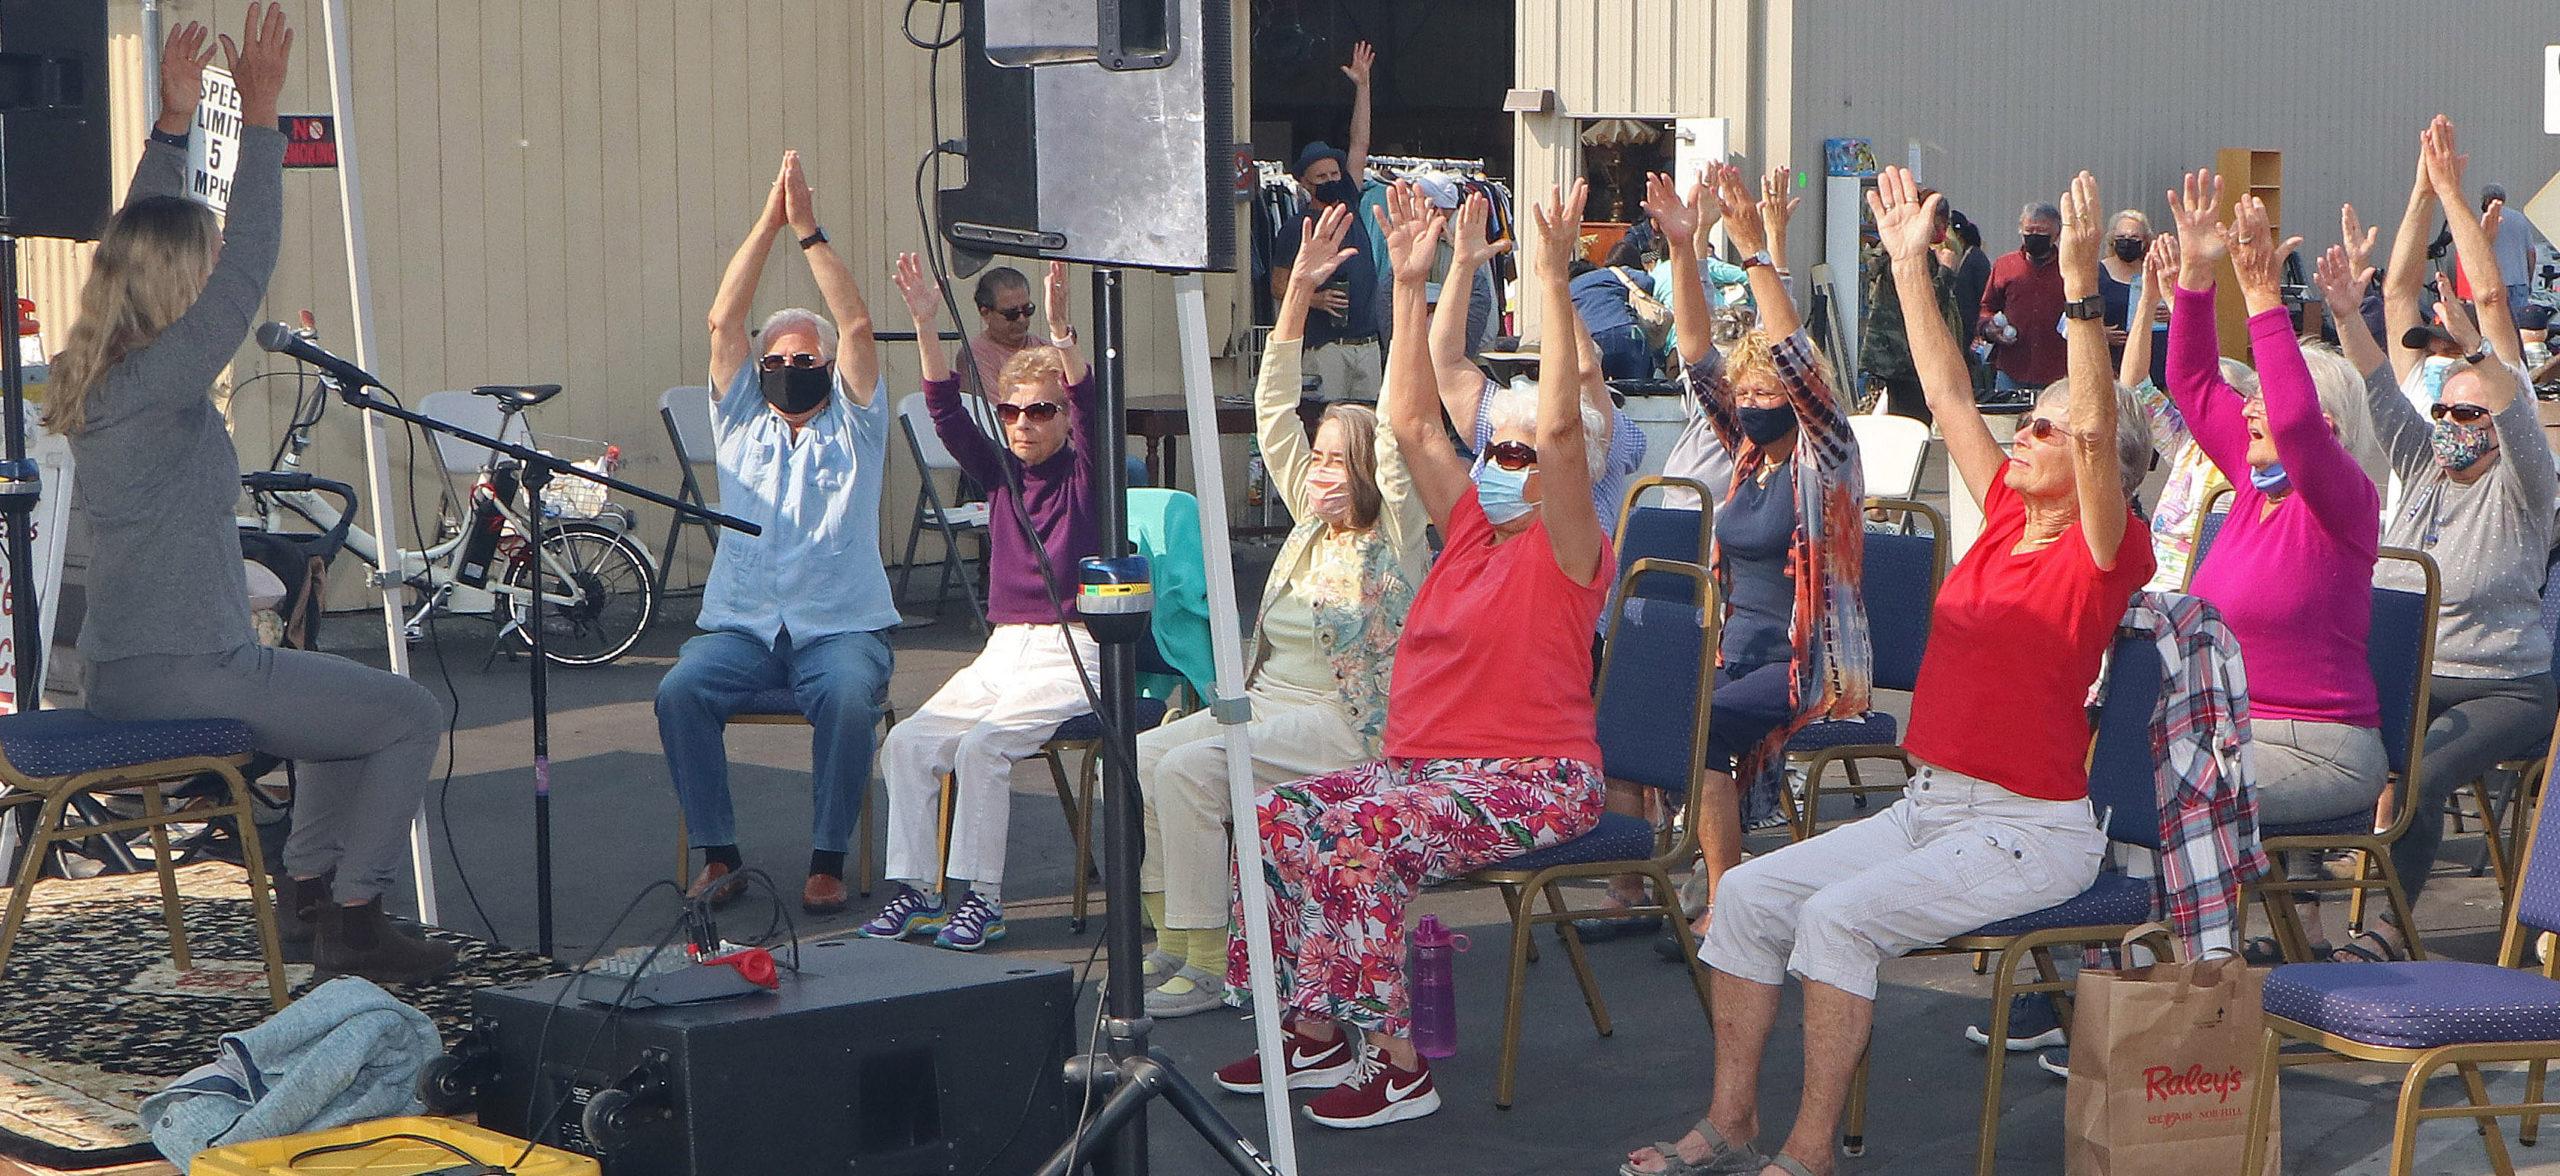 Outdoor chair yoga class at Grey Bears harvest festival